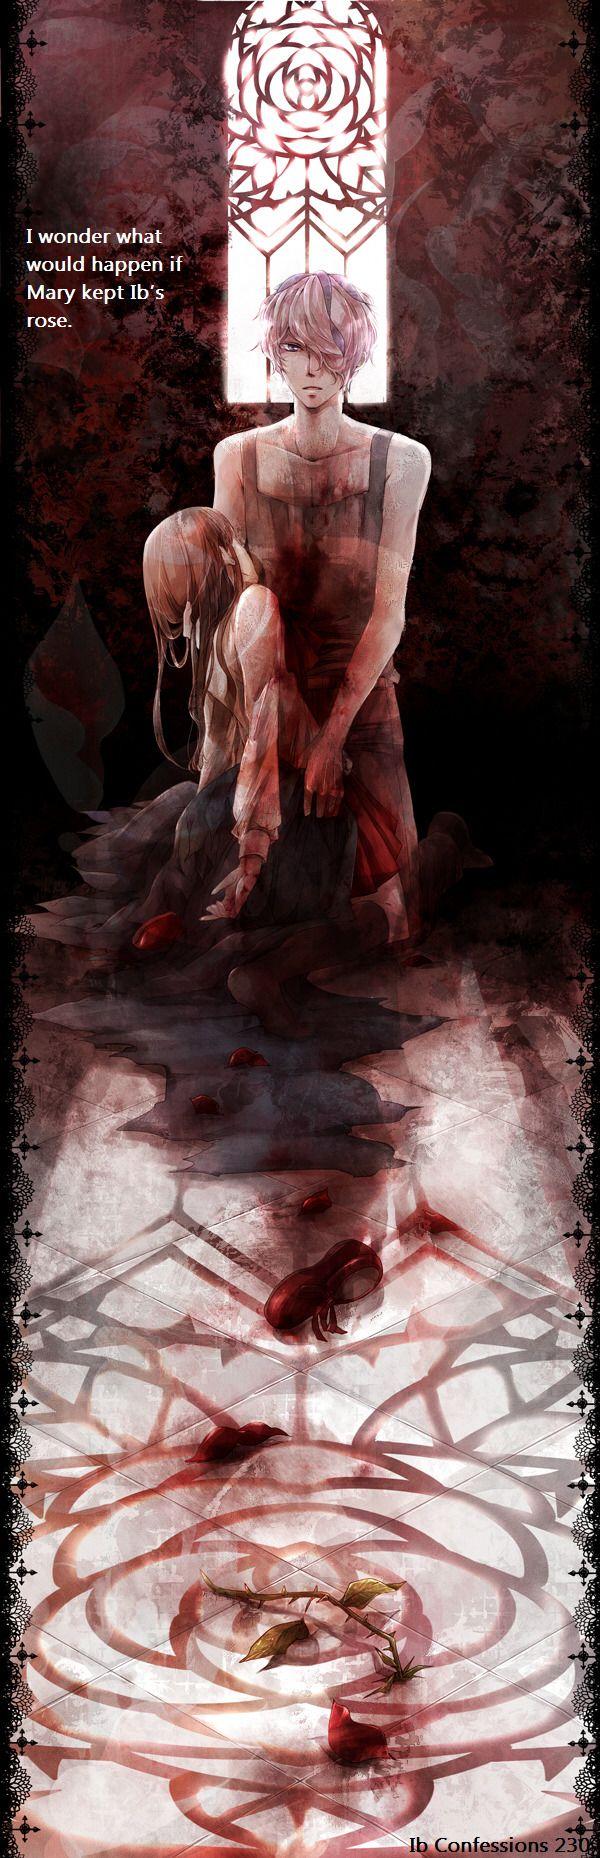 Confessor Art I wonder what would happen if Mary kept Ib's rose.